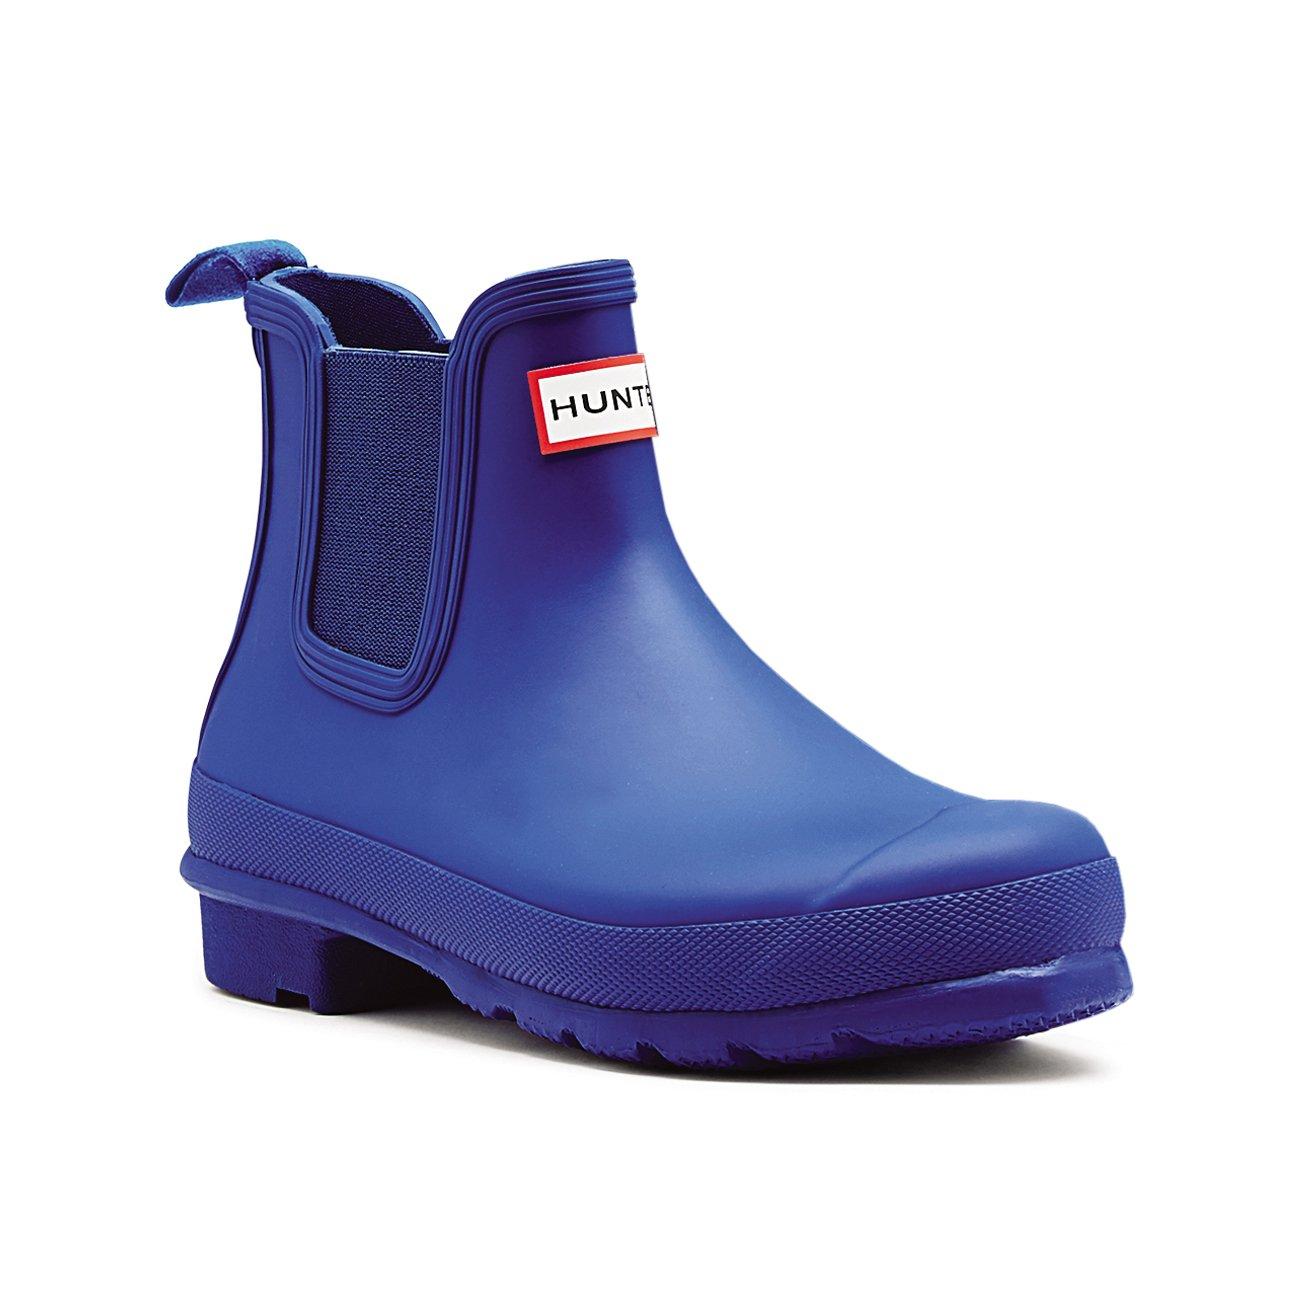 Damen Hunter Original Original Original Chelsea Schnee Regen Wasserdicht Knöchel Stiefel EU 36-43 f6b5b6